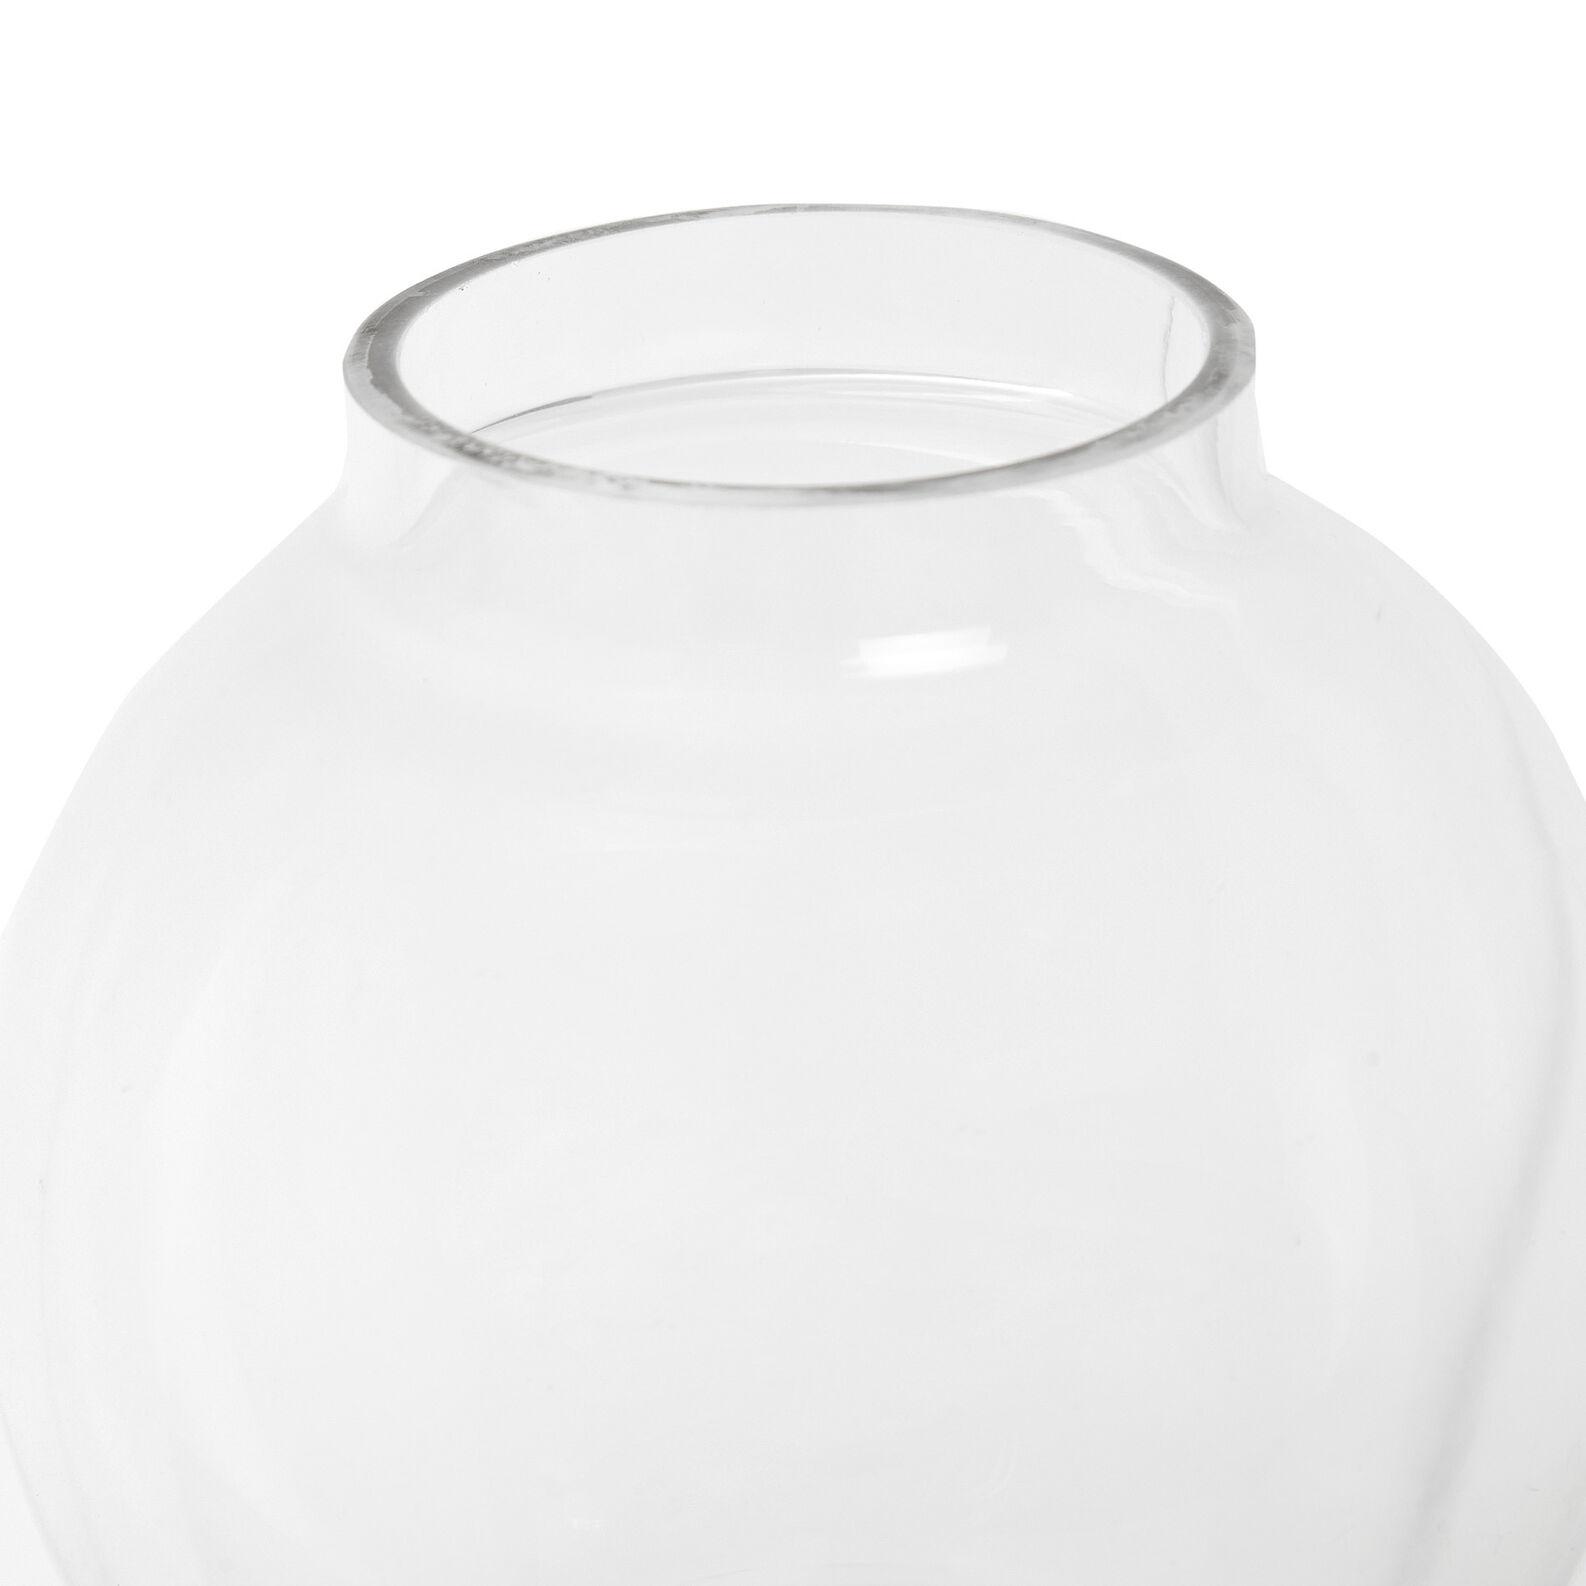 Vaso vetro con fondo argento